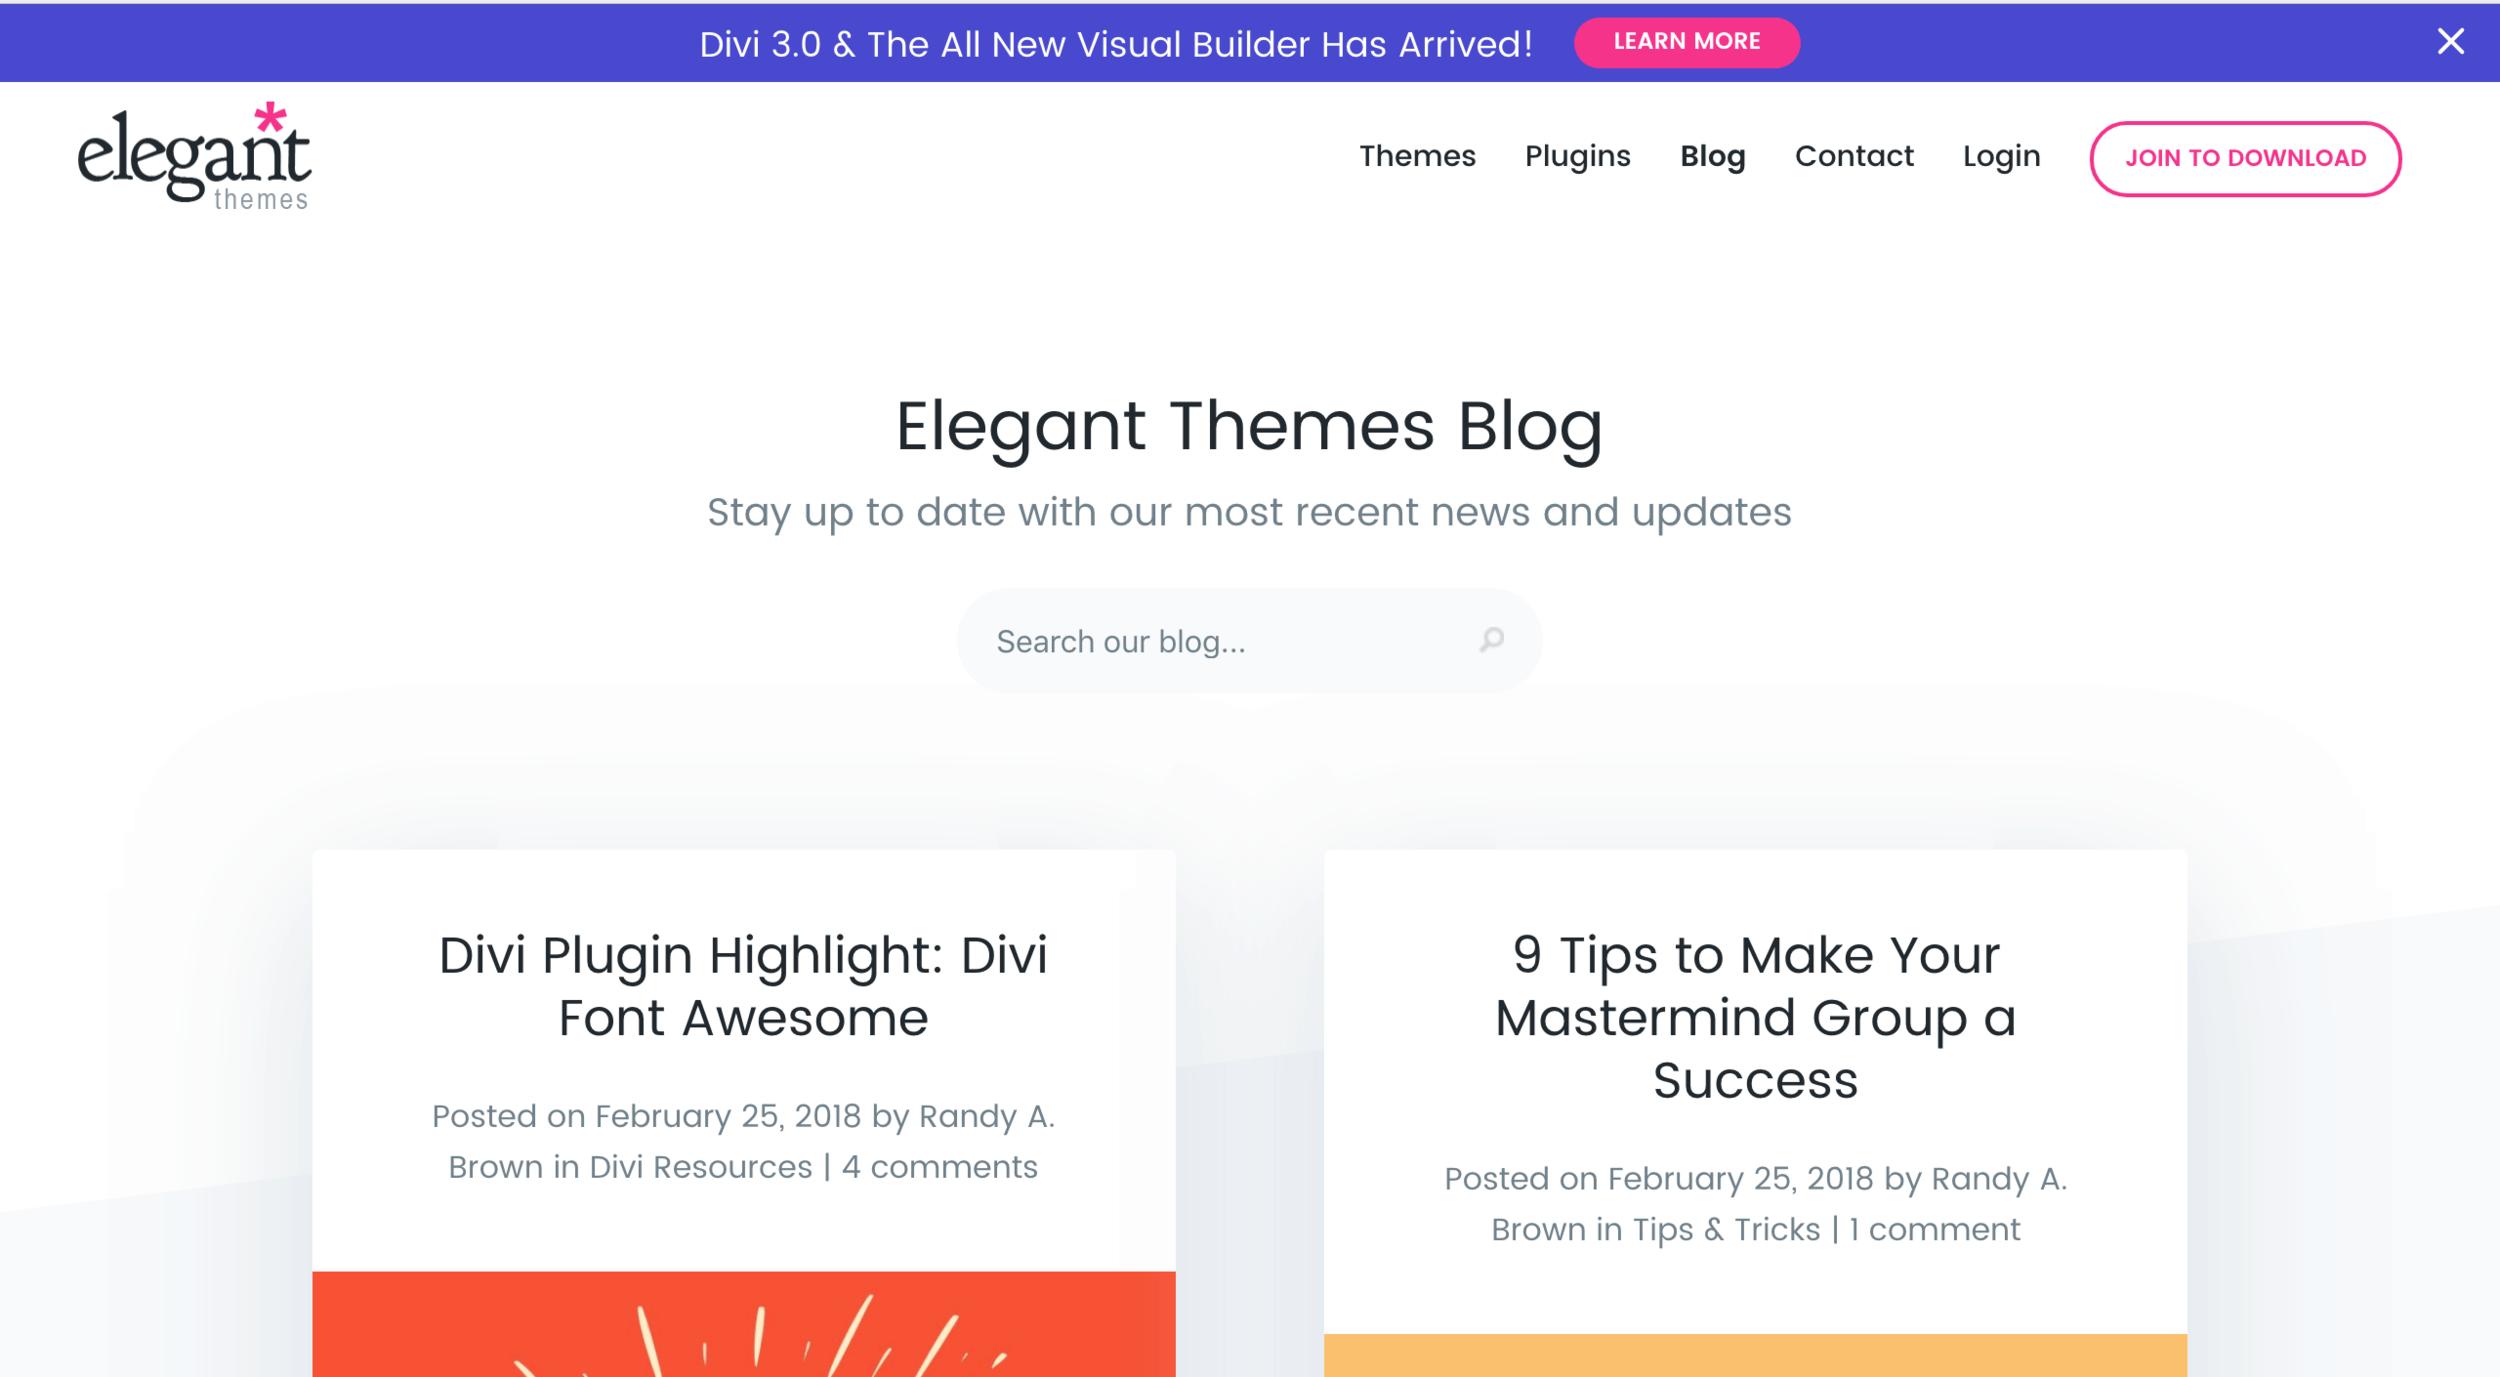 Divi blog